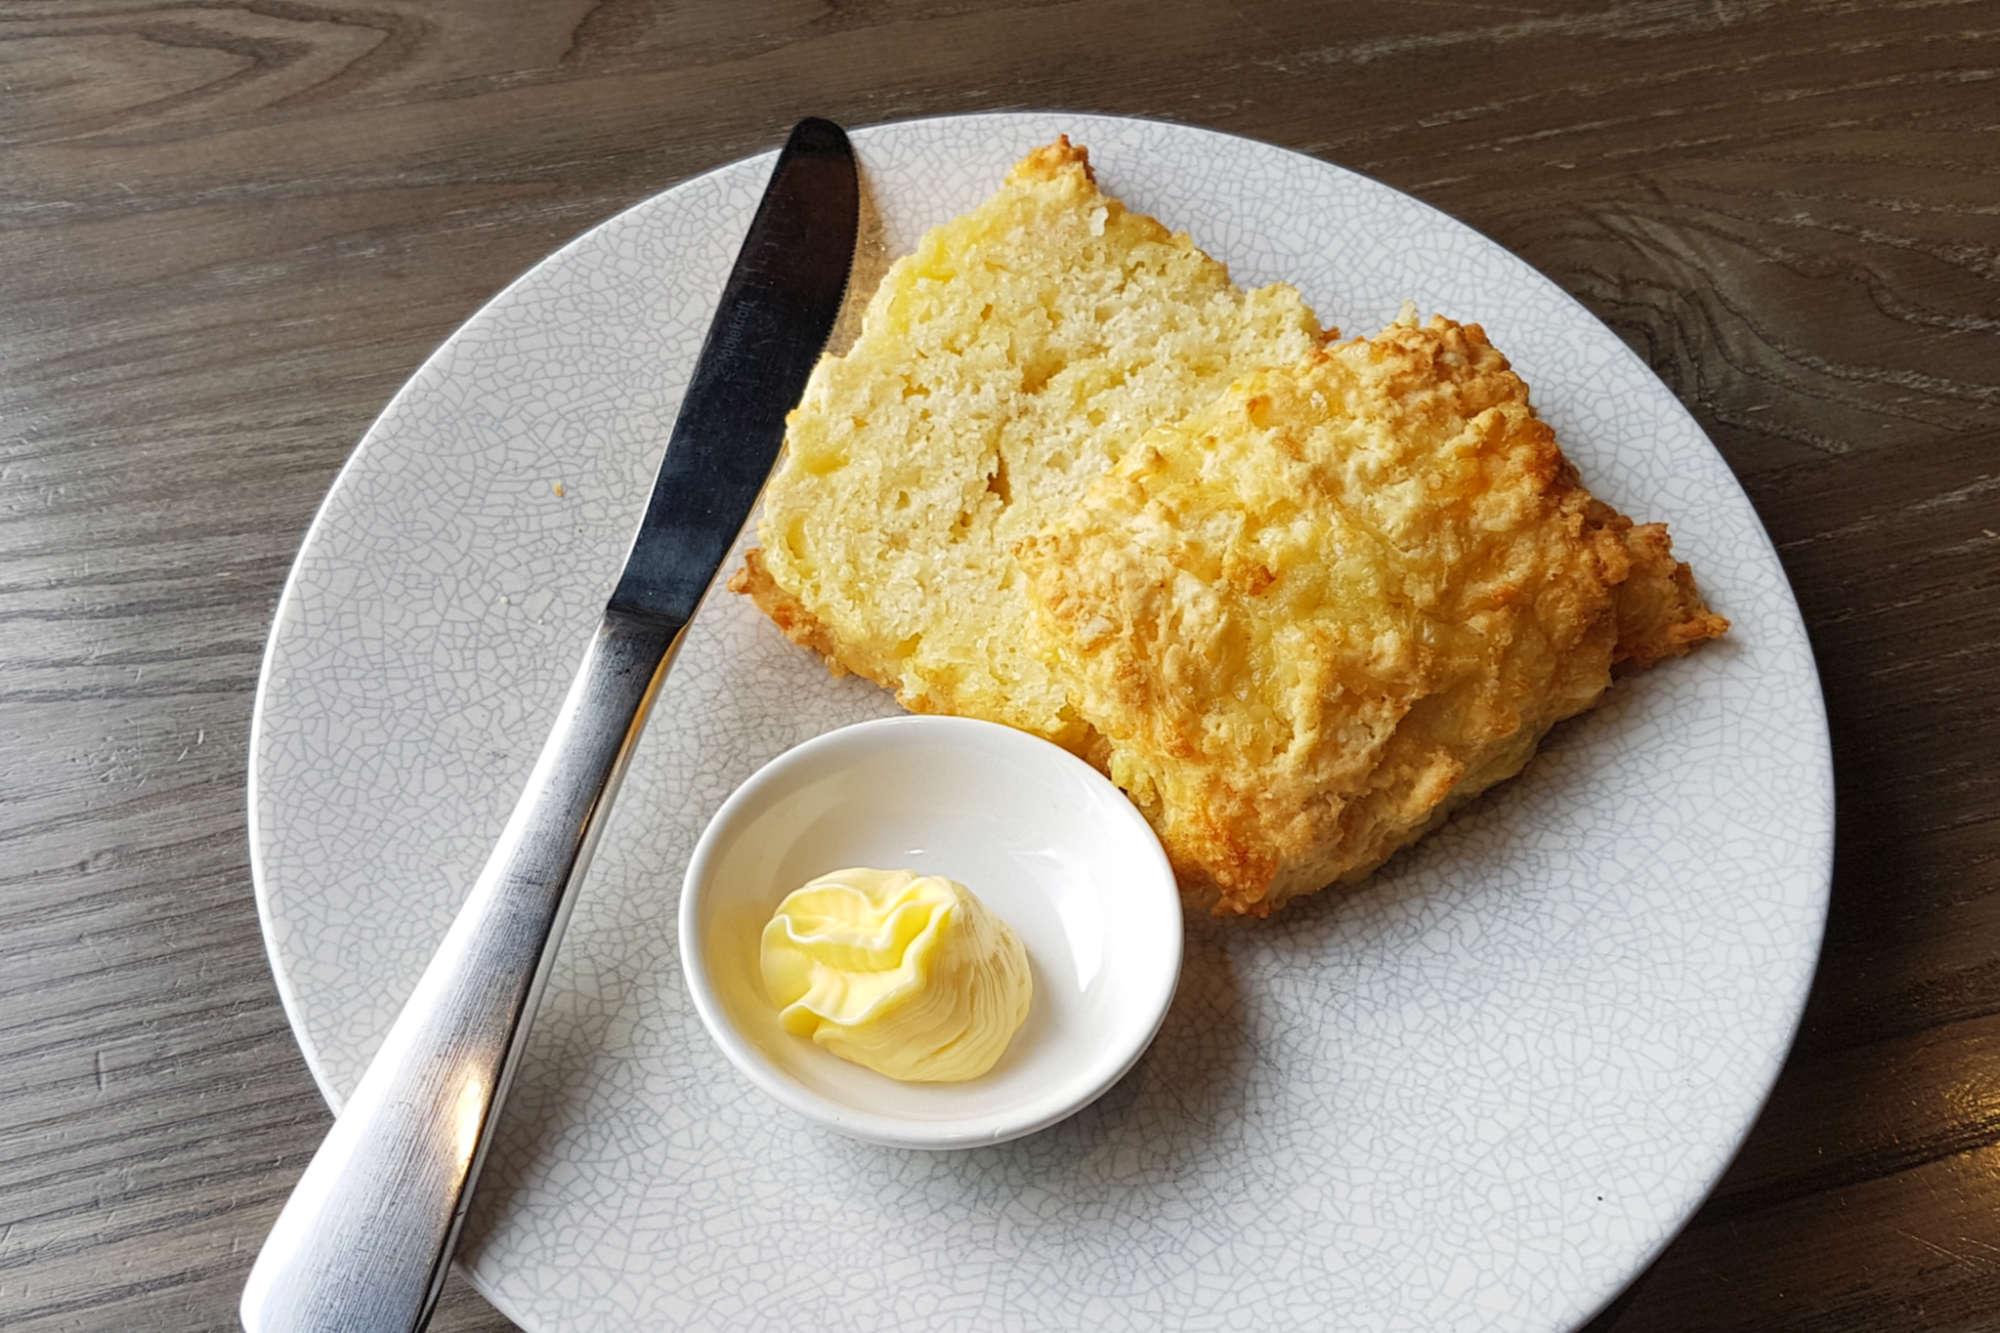 Bellbird Eatery - cheese scone